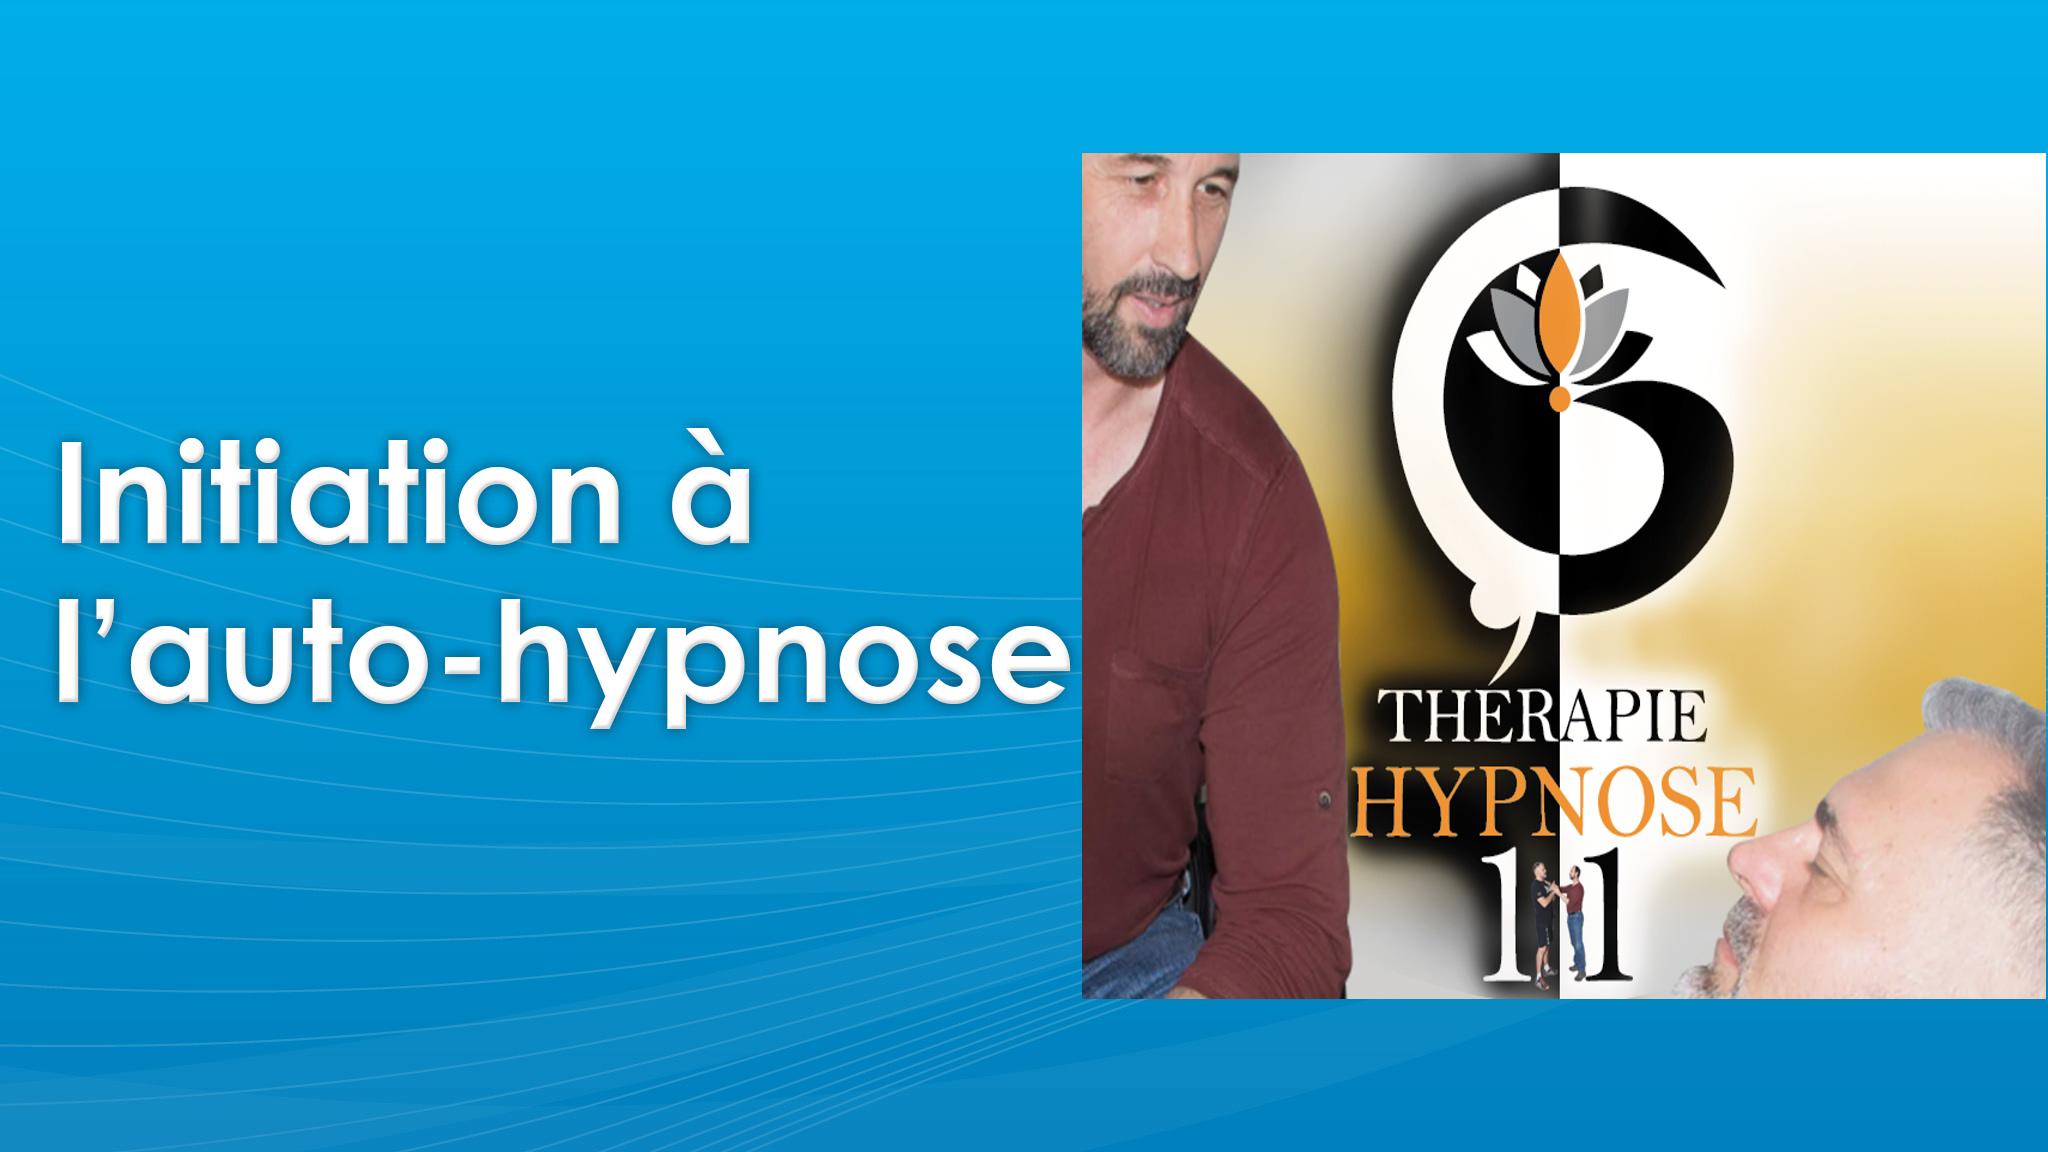 Auto hypnose therapiehypnose11.fr